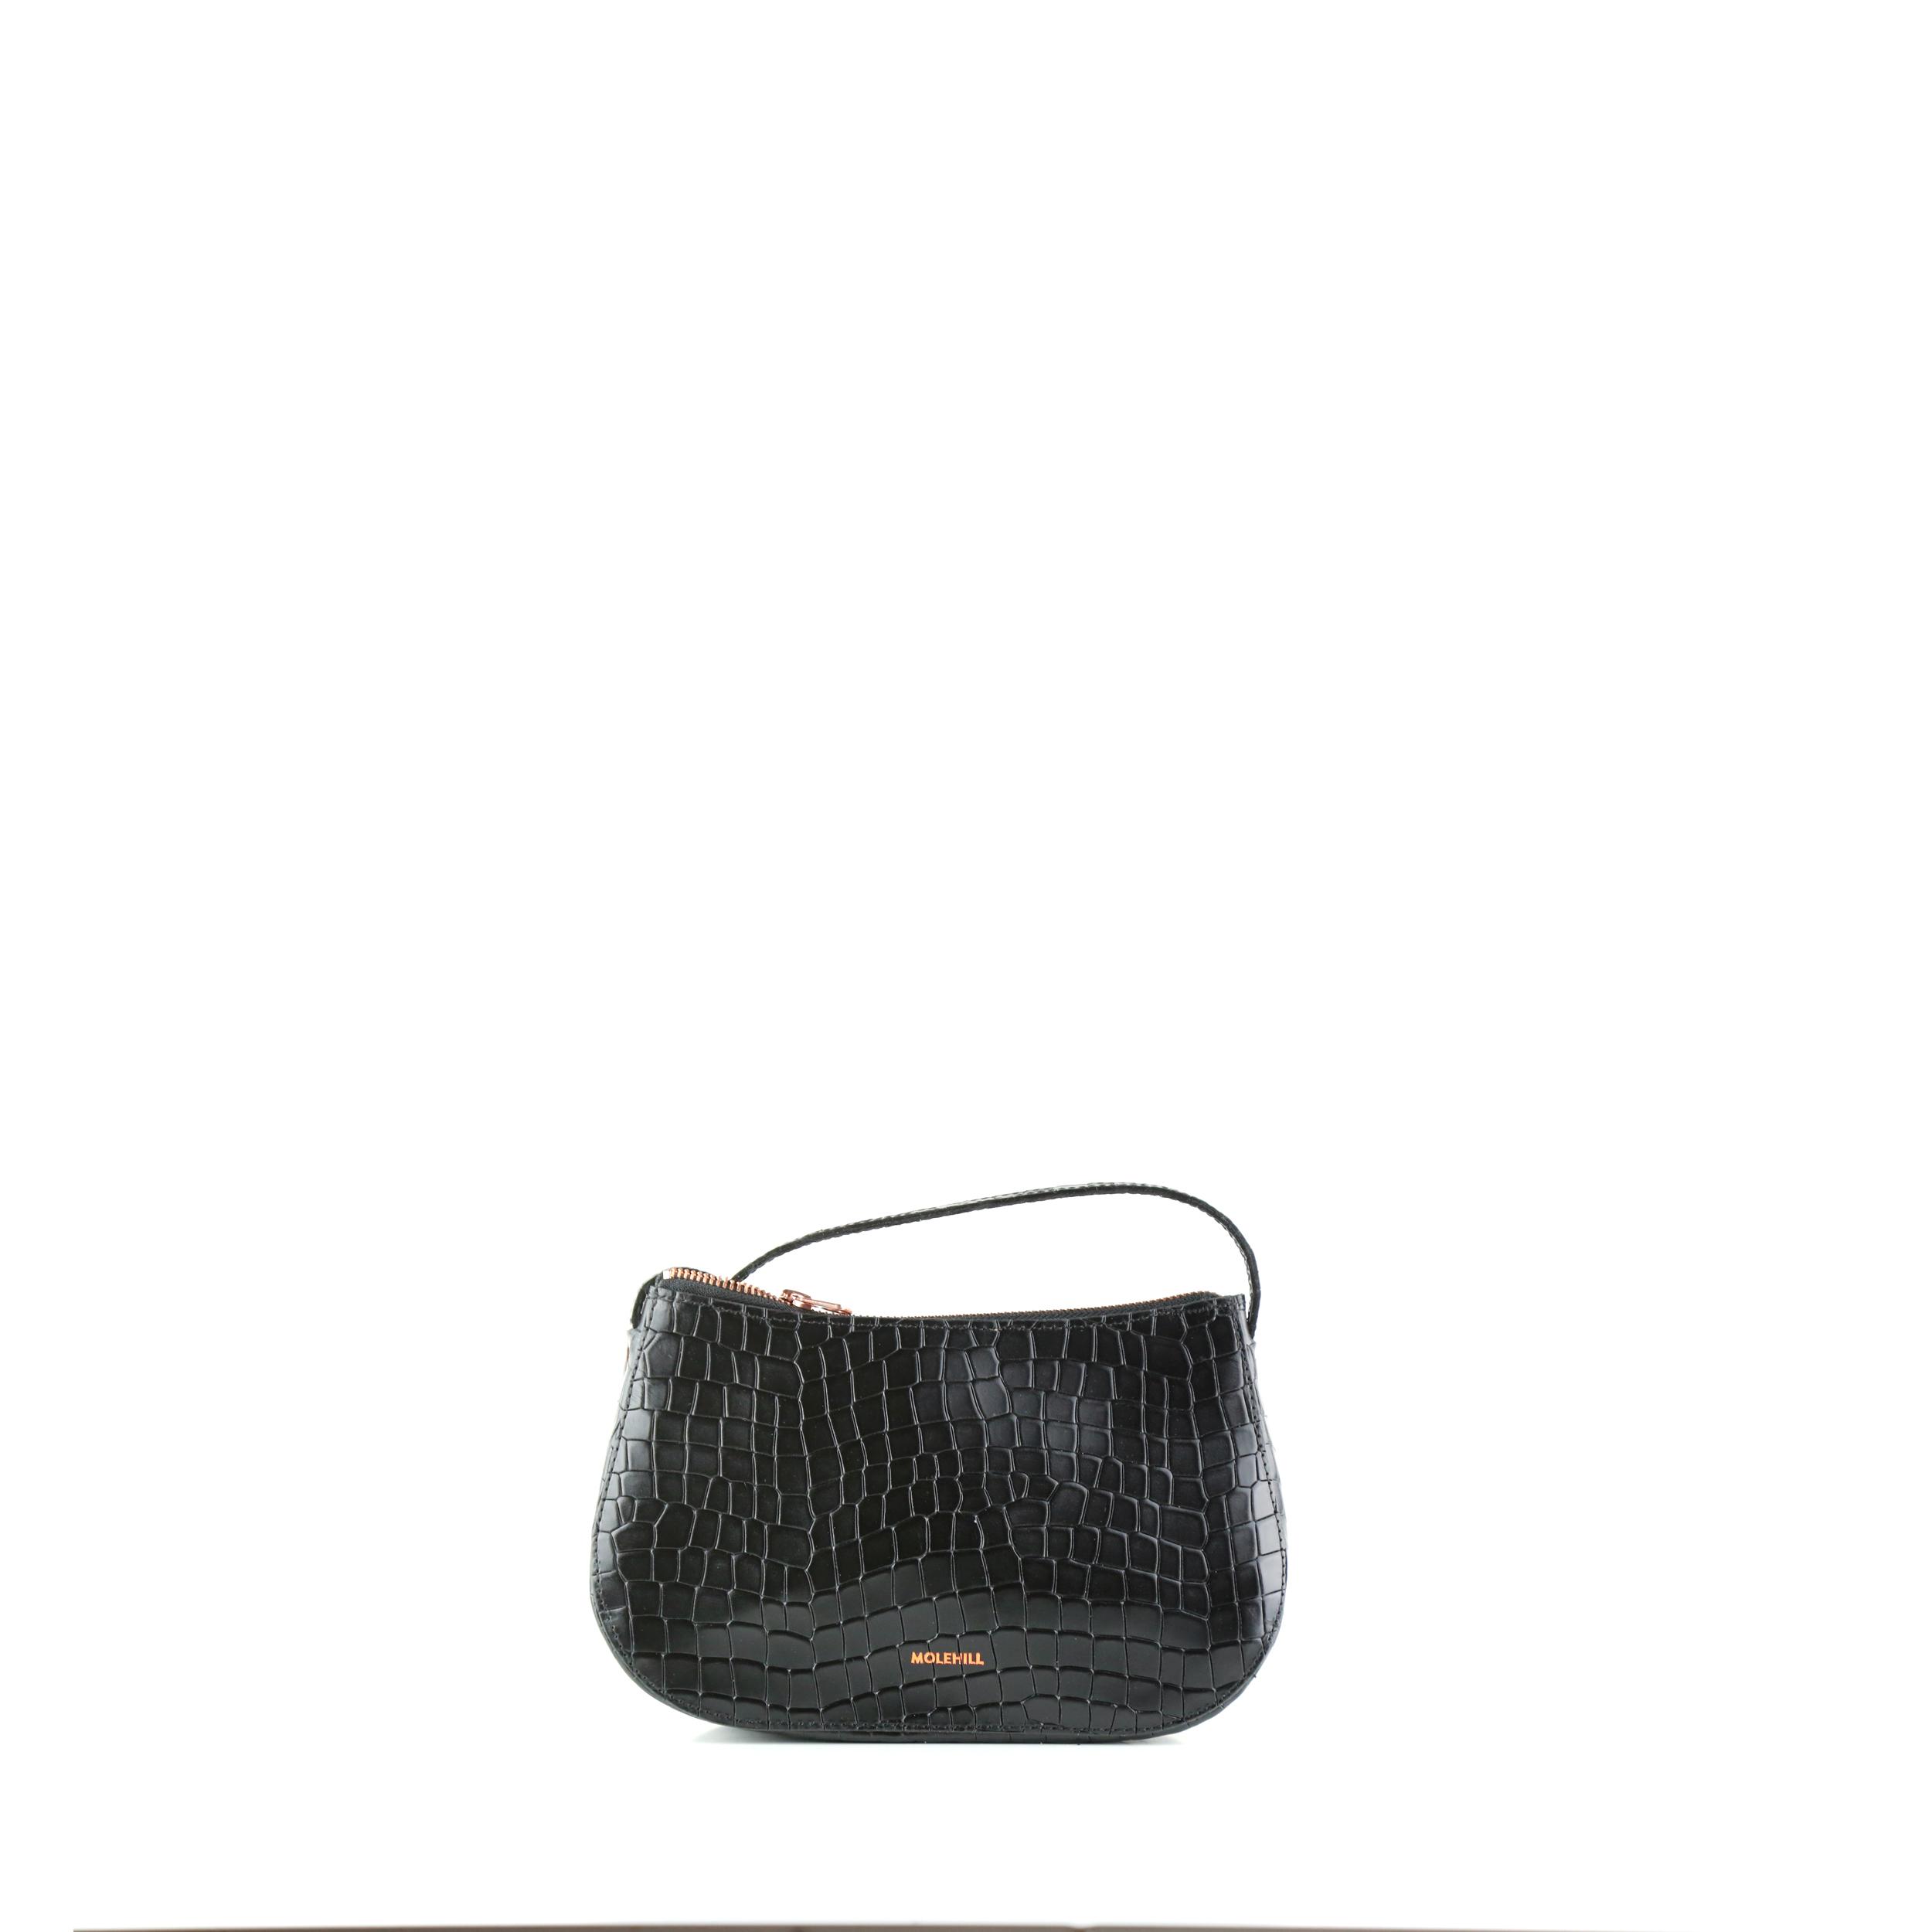 Torba-BOAT Crossbody Bag Croco Black-1